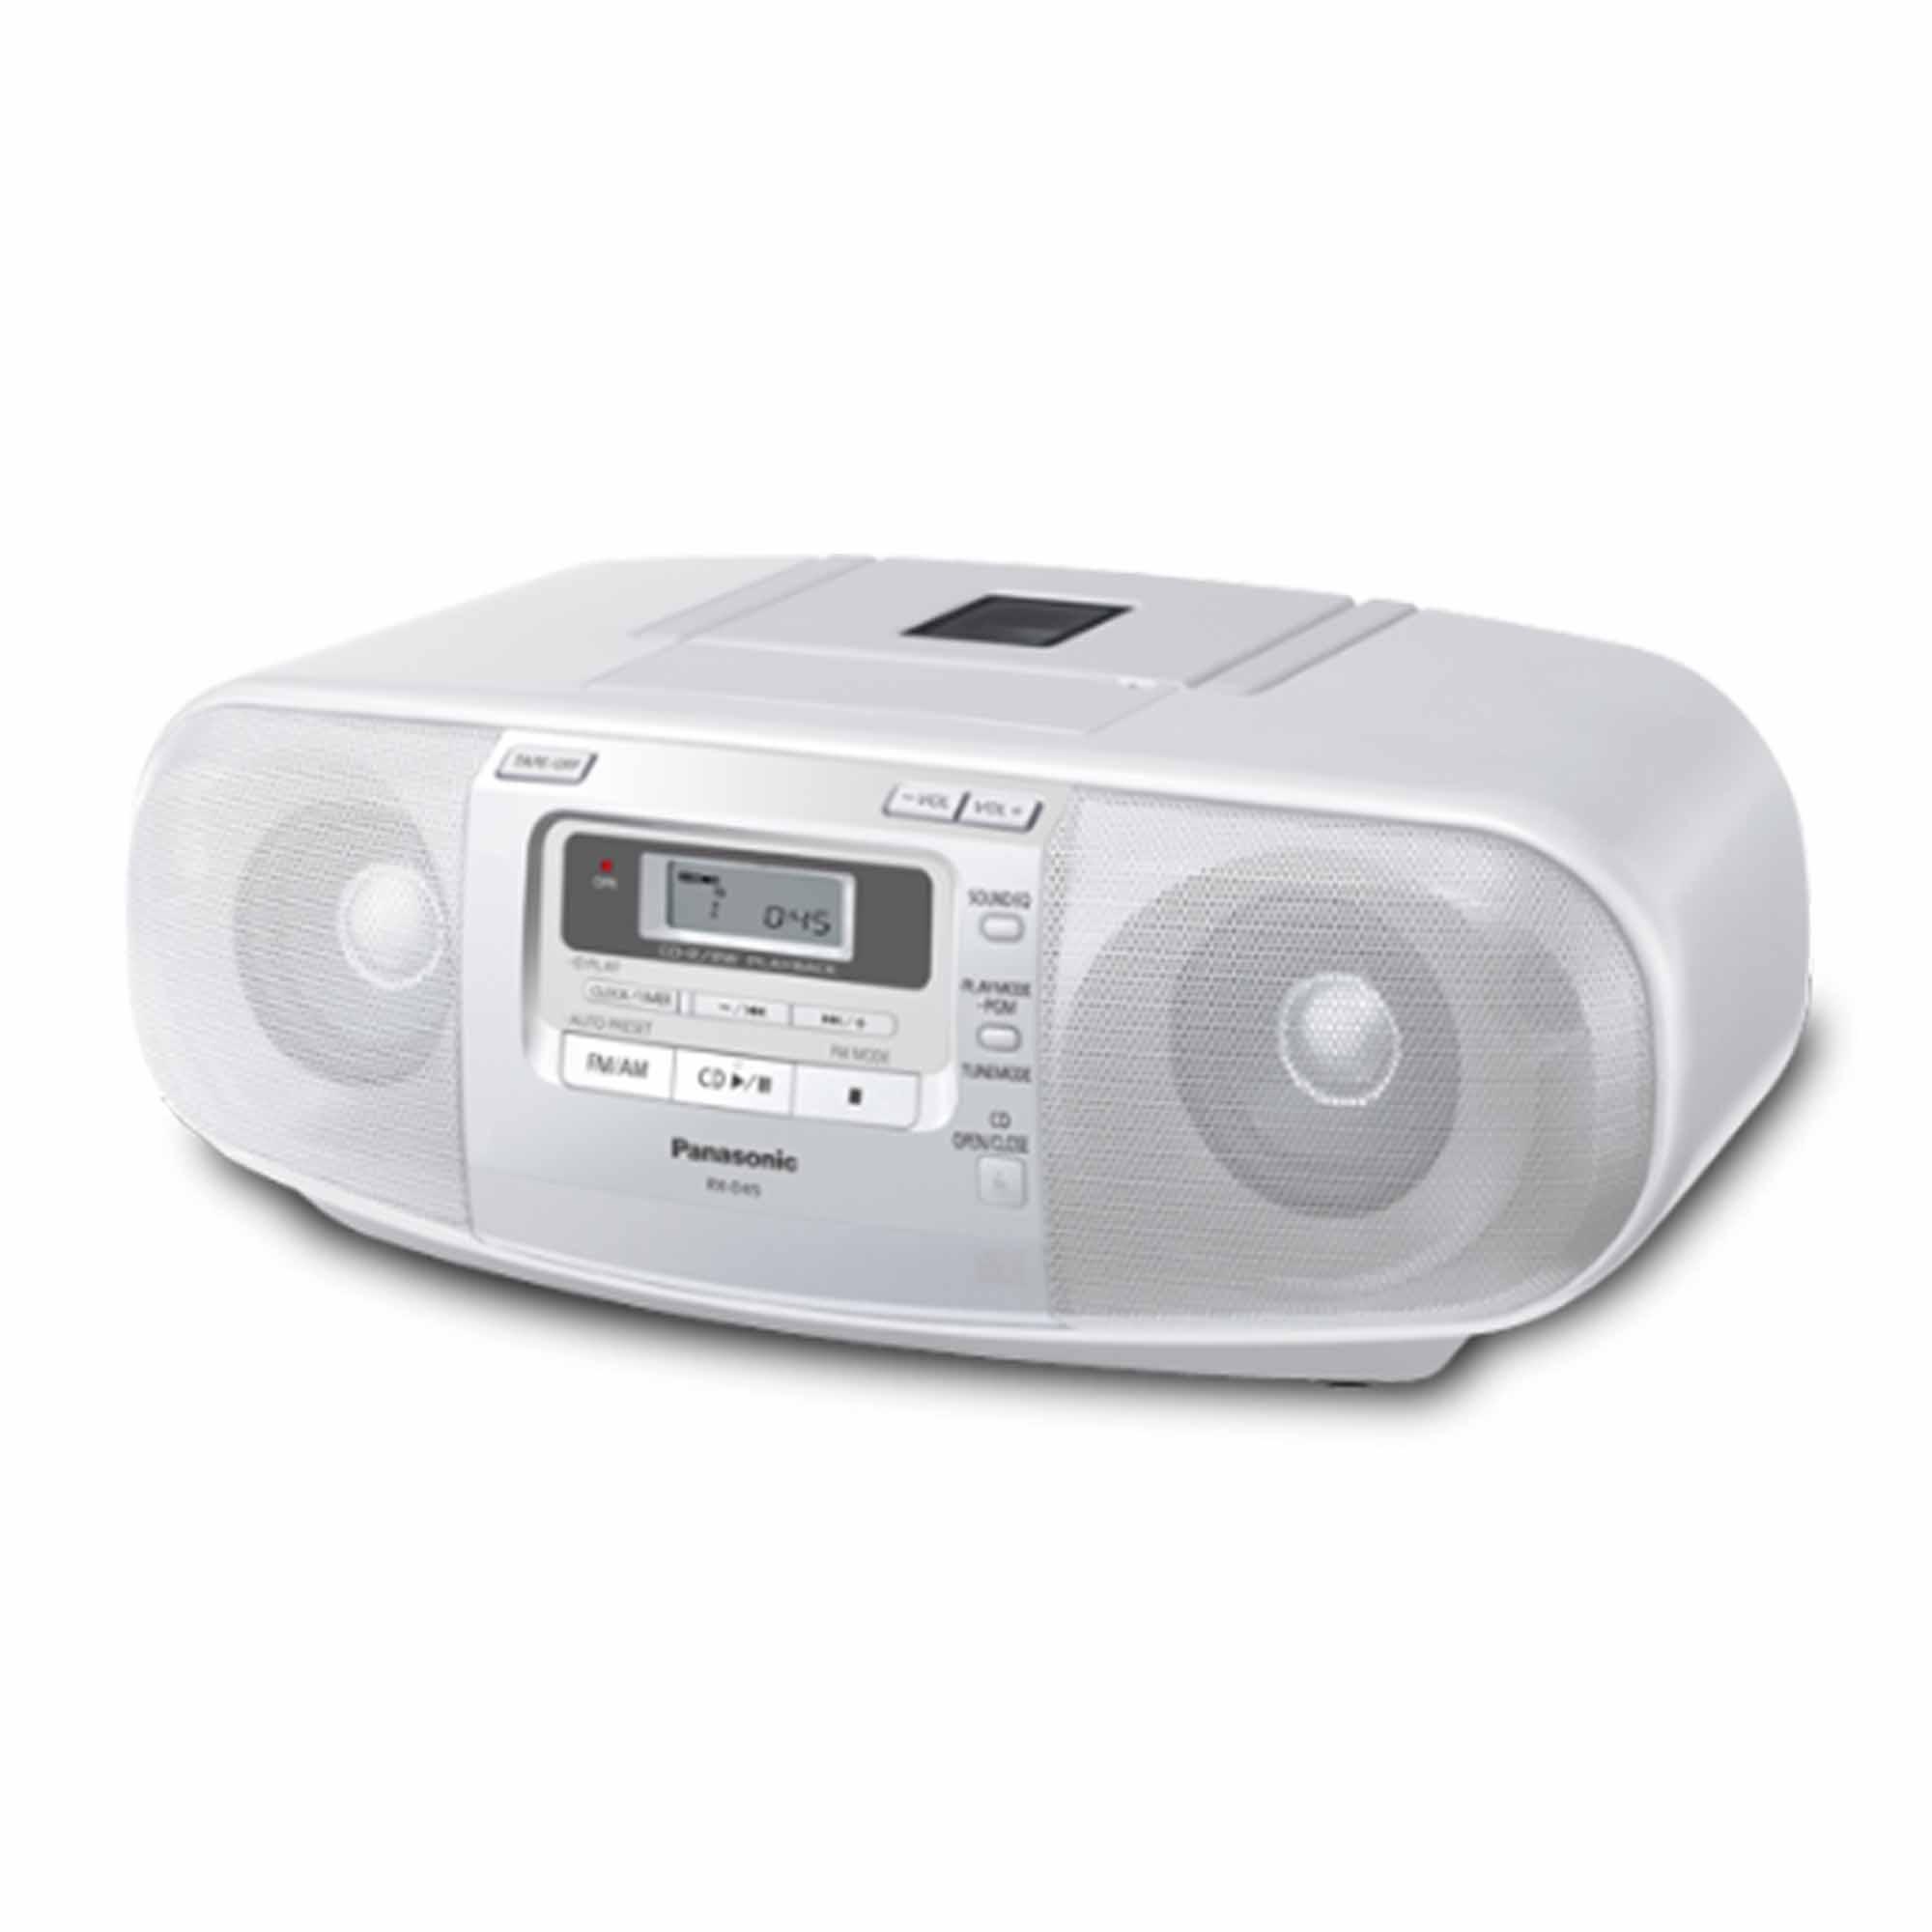 Panasonic Radio RX-D45 (60W) CD Playe (end 5/2/2020 6:06 PM)